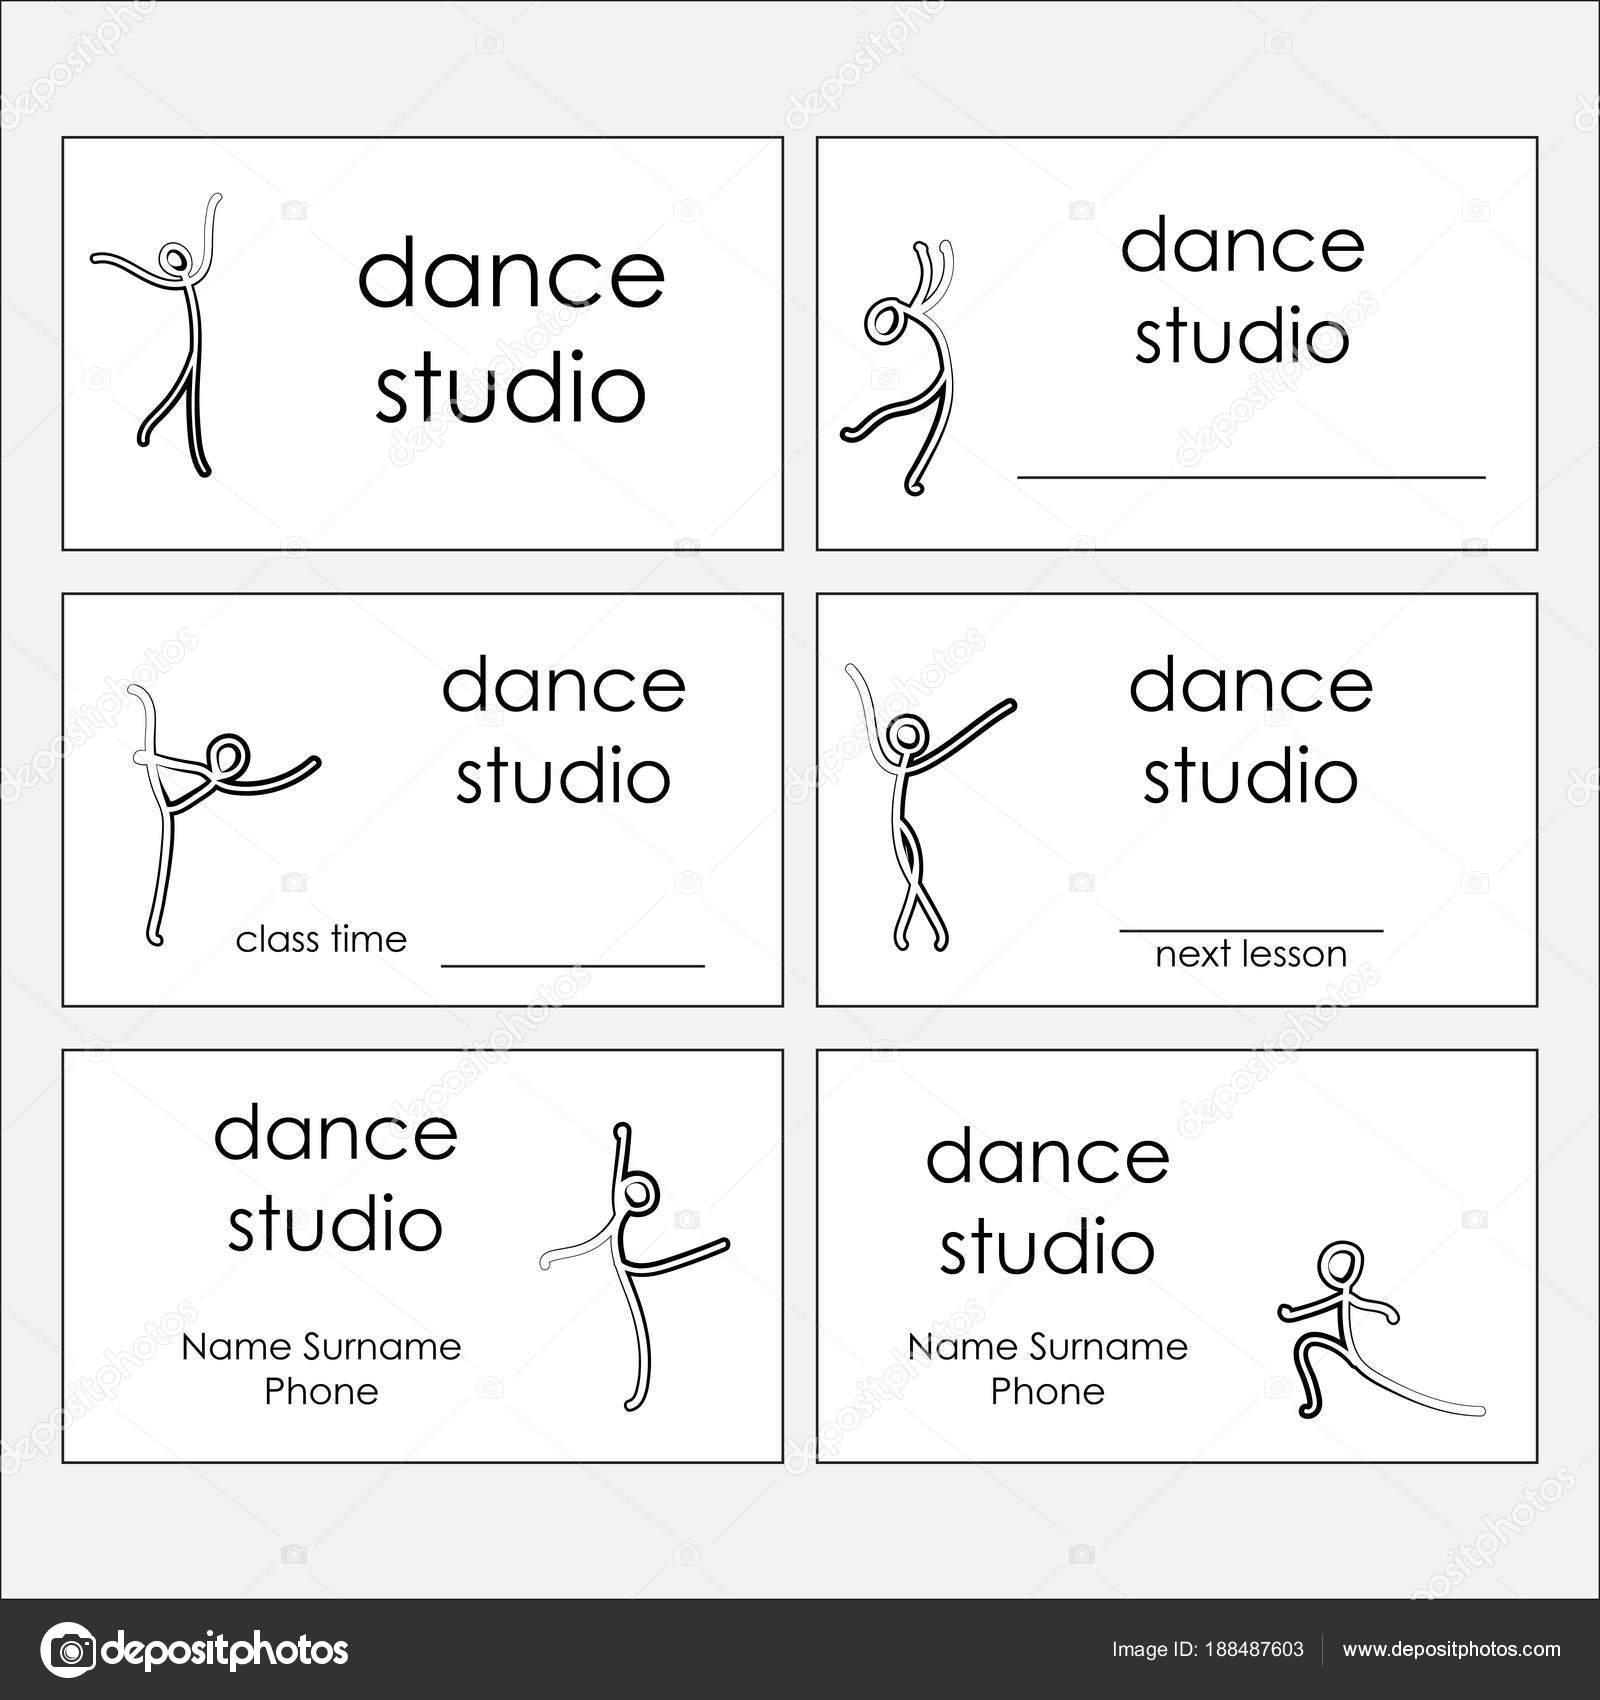 Design of business cards of dance studio, dance club. Vector ...